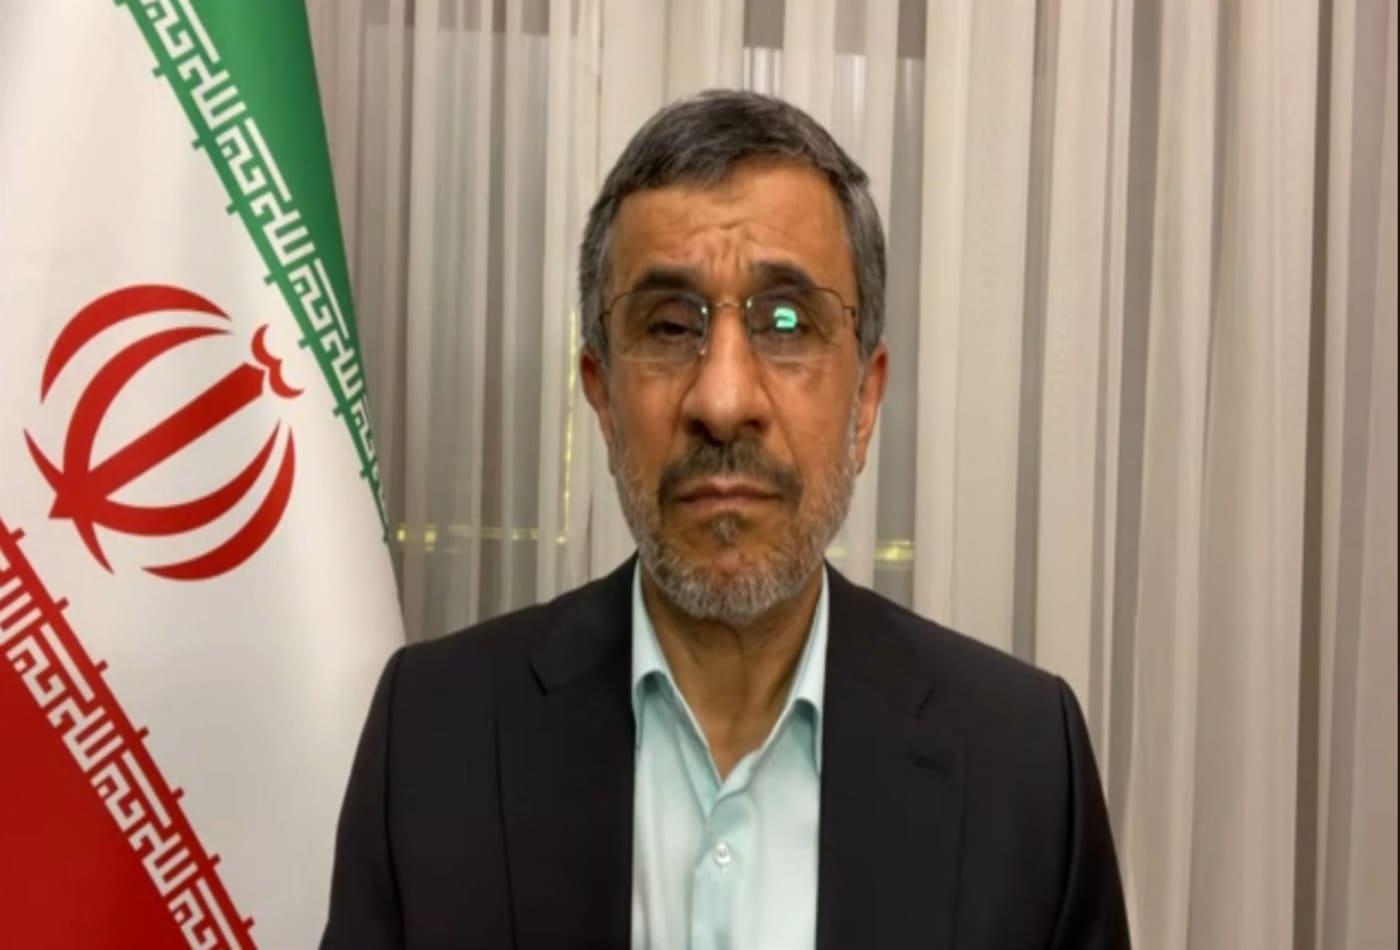 Former Iran President Mahmoud Ahmadinejad discusses nuclear deal